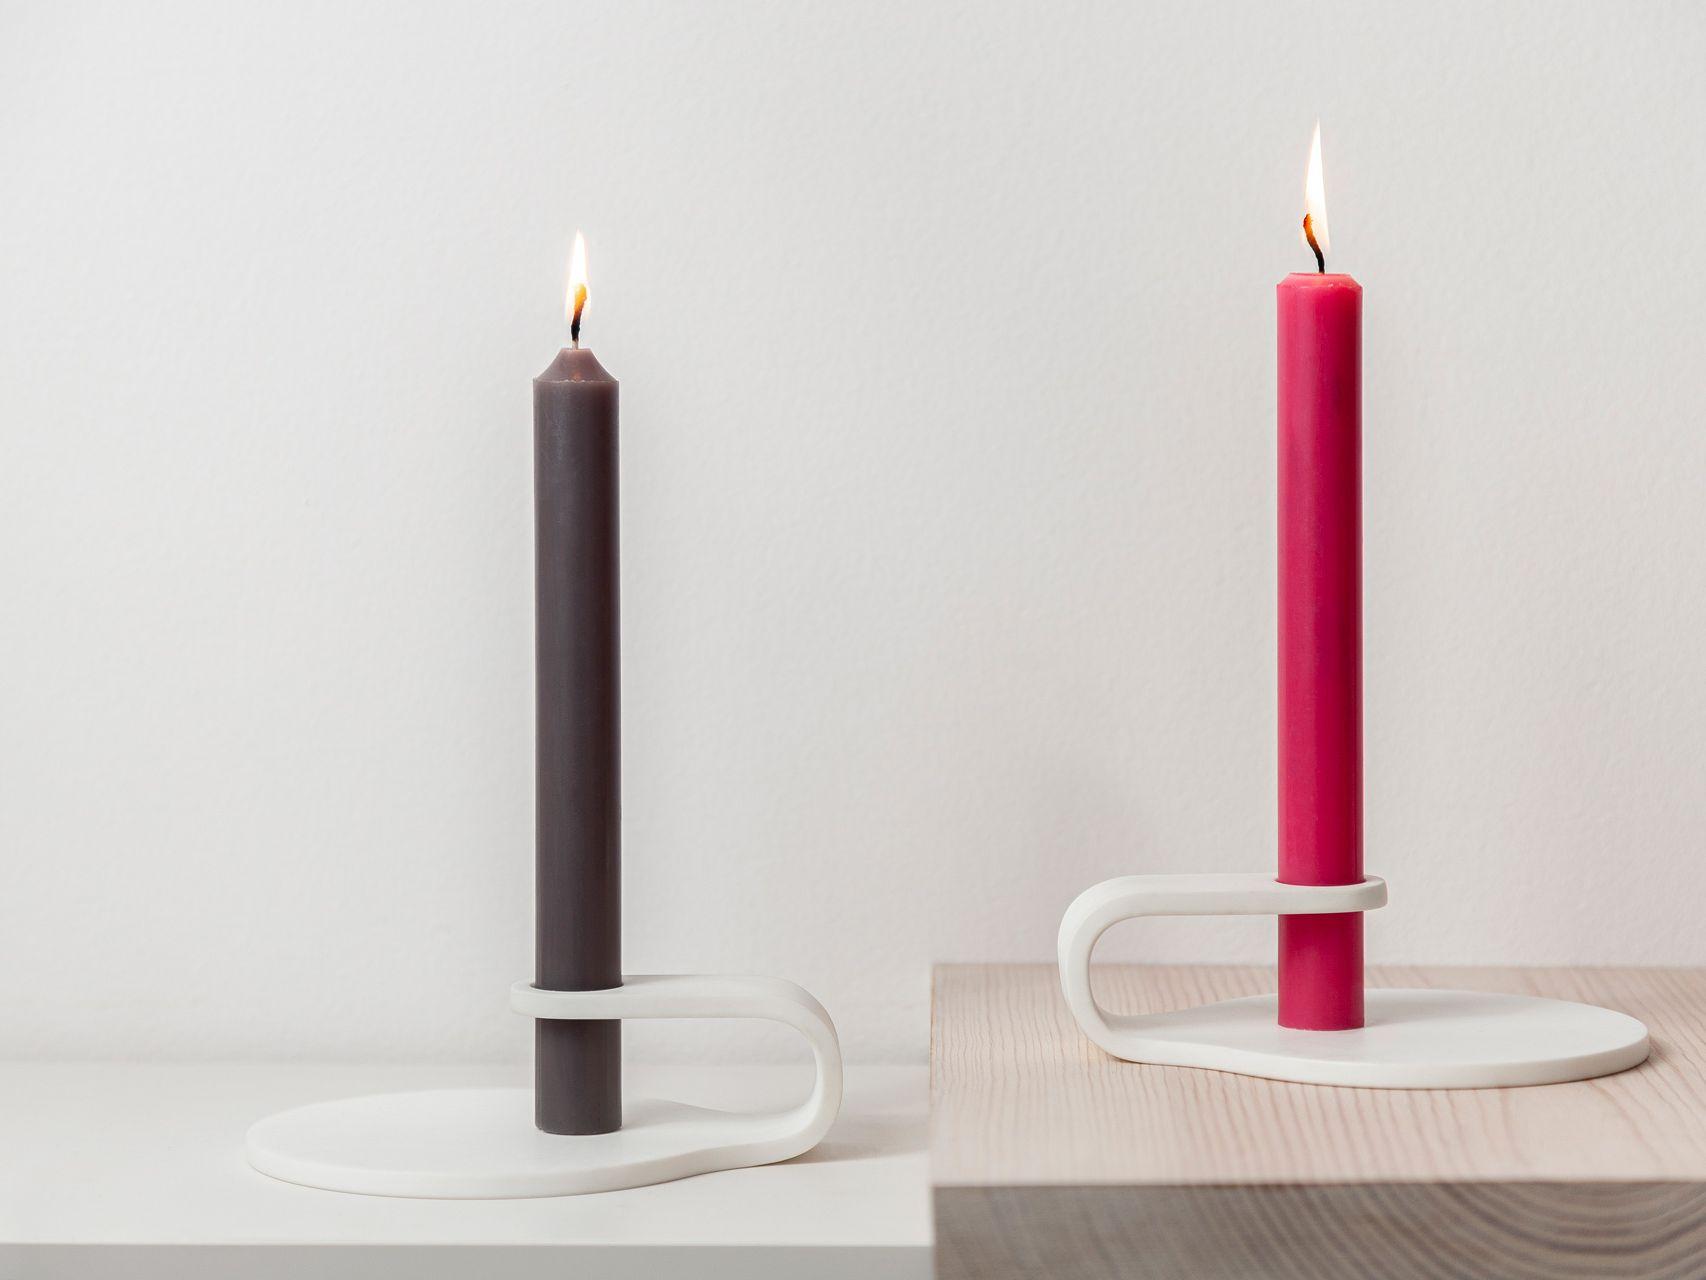 Hole Candlestick